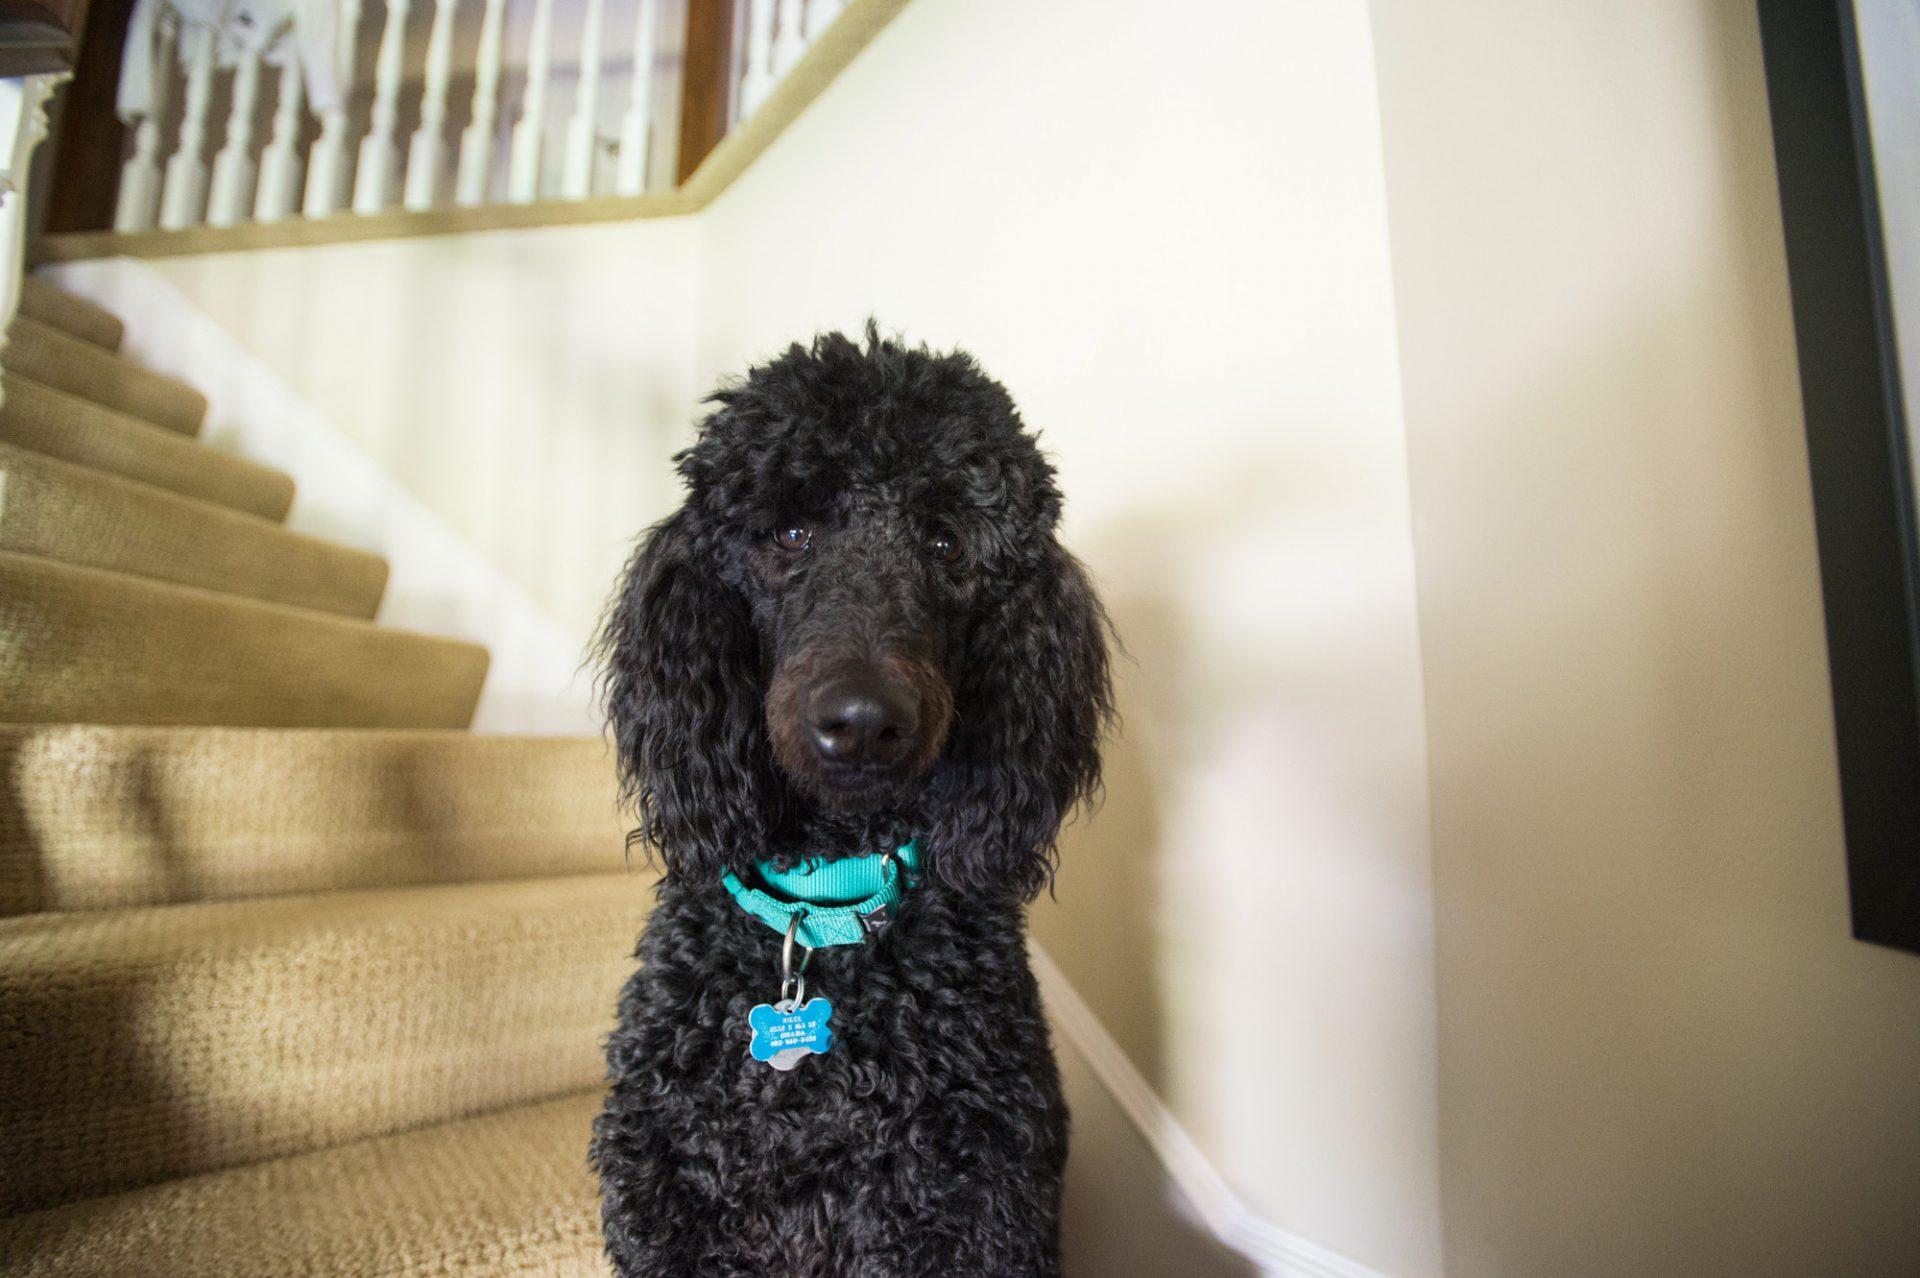 Photo: Nigel, a black poodle.